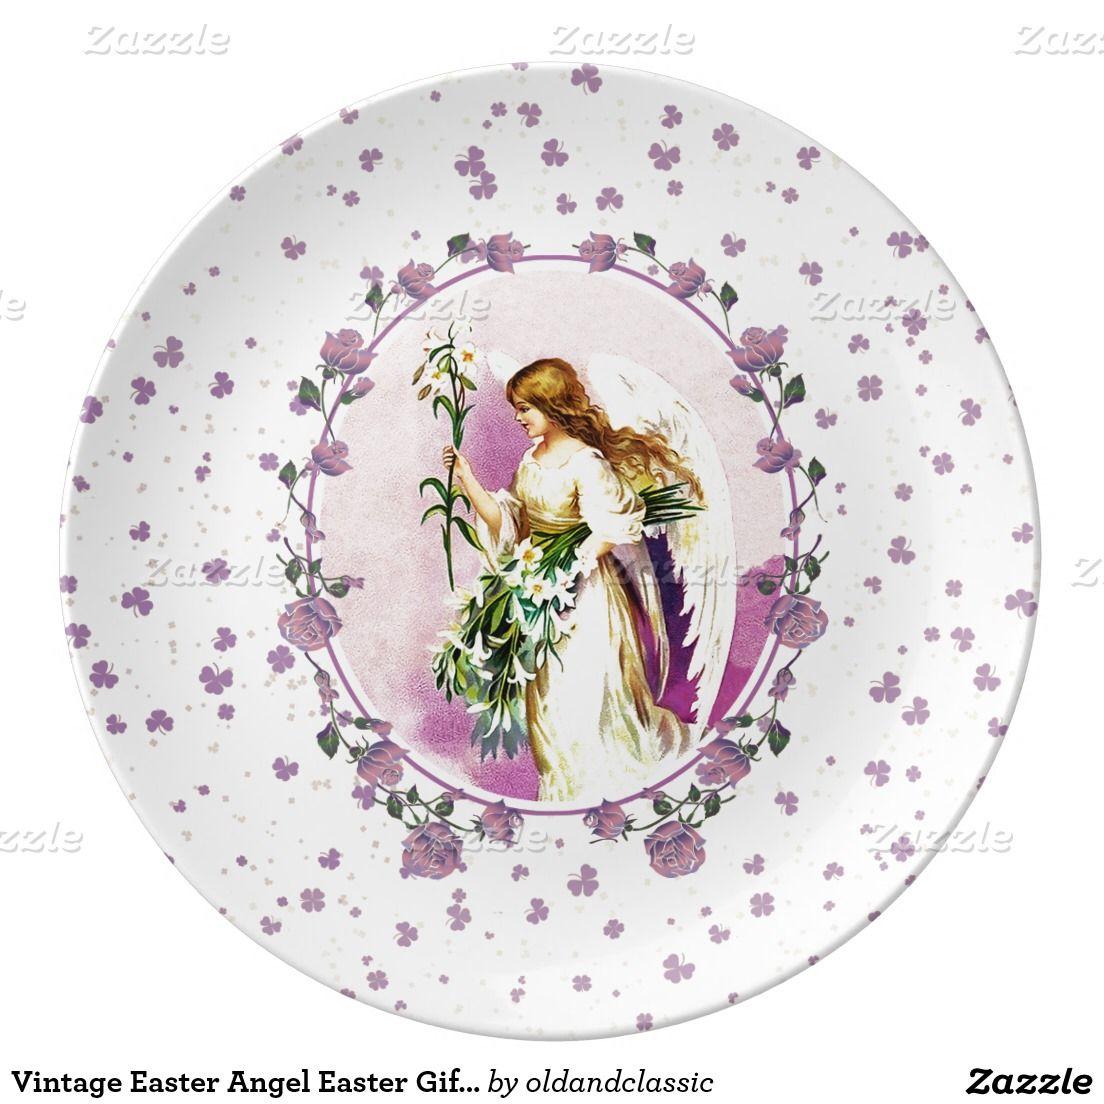 Easter christian gift decorative porcelain plates with a vintage shop vintage easter angel easter gift porcelain plates created by oldandclassic negle Gallery